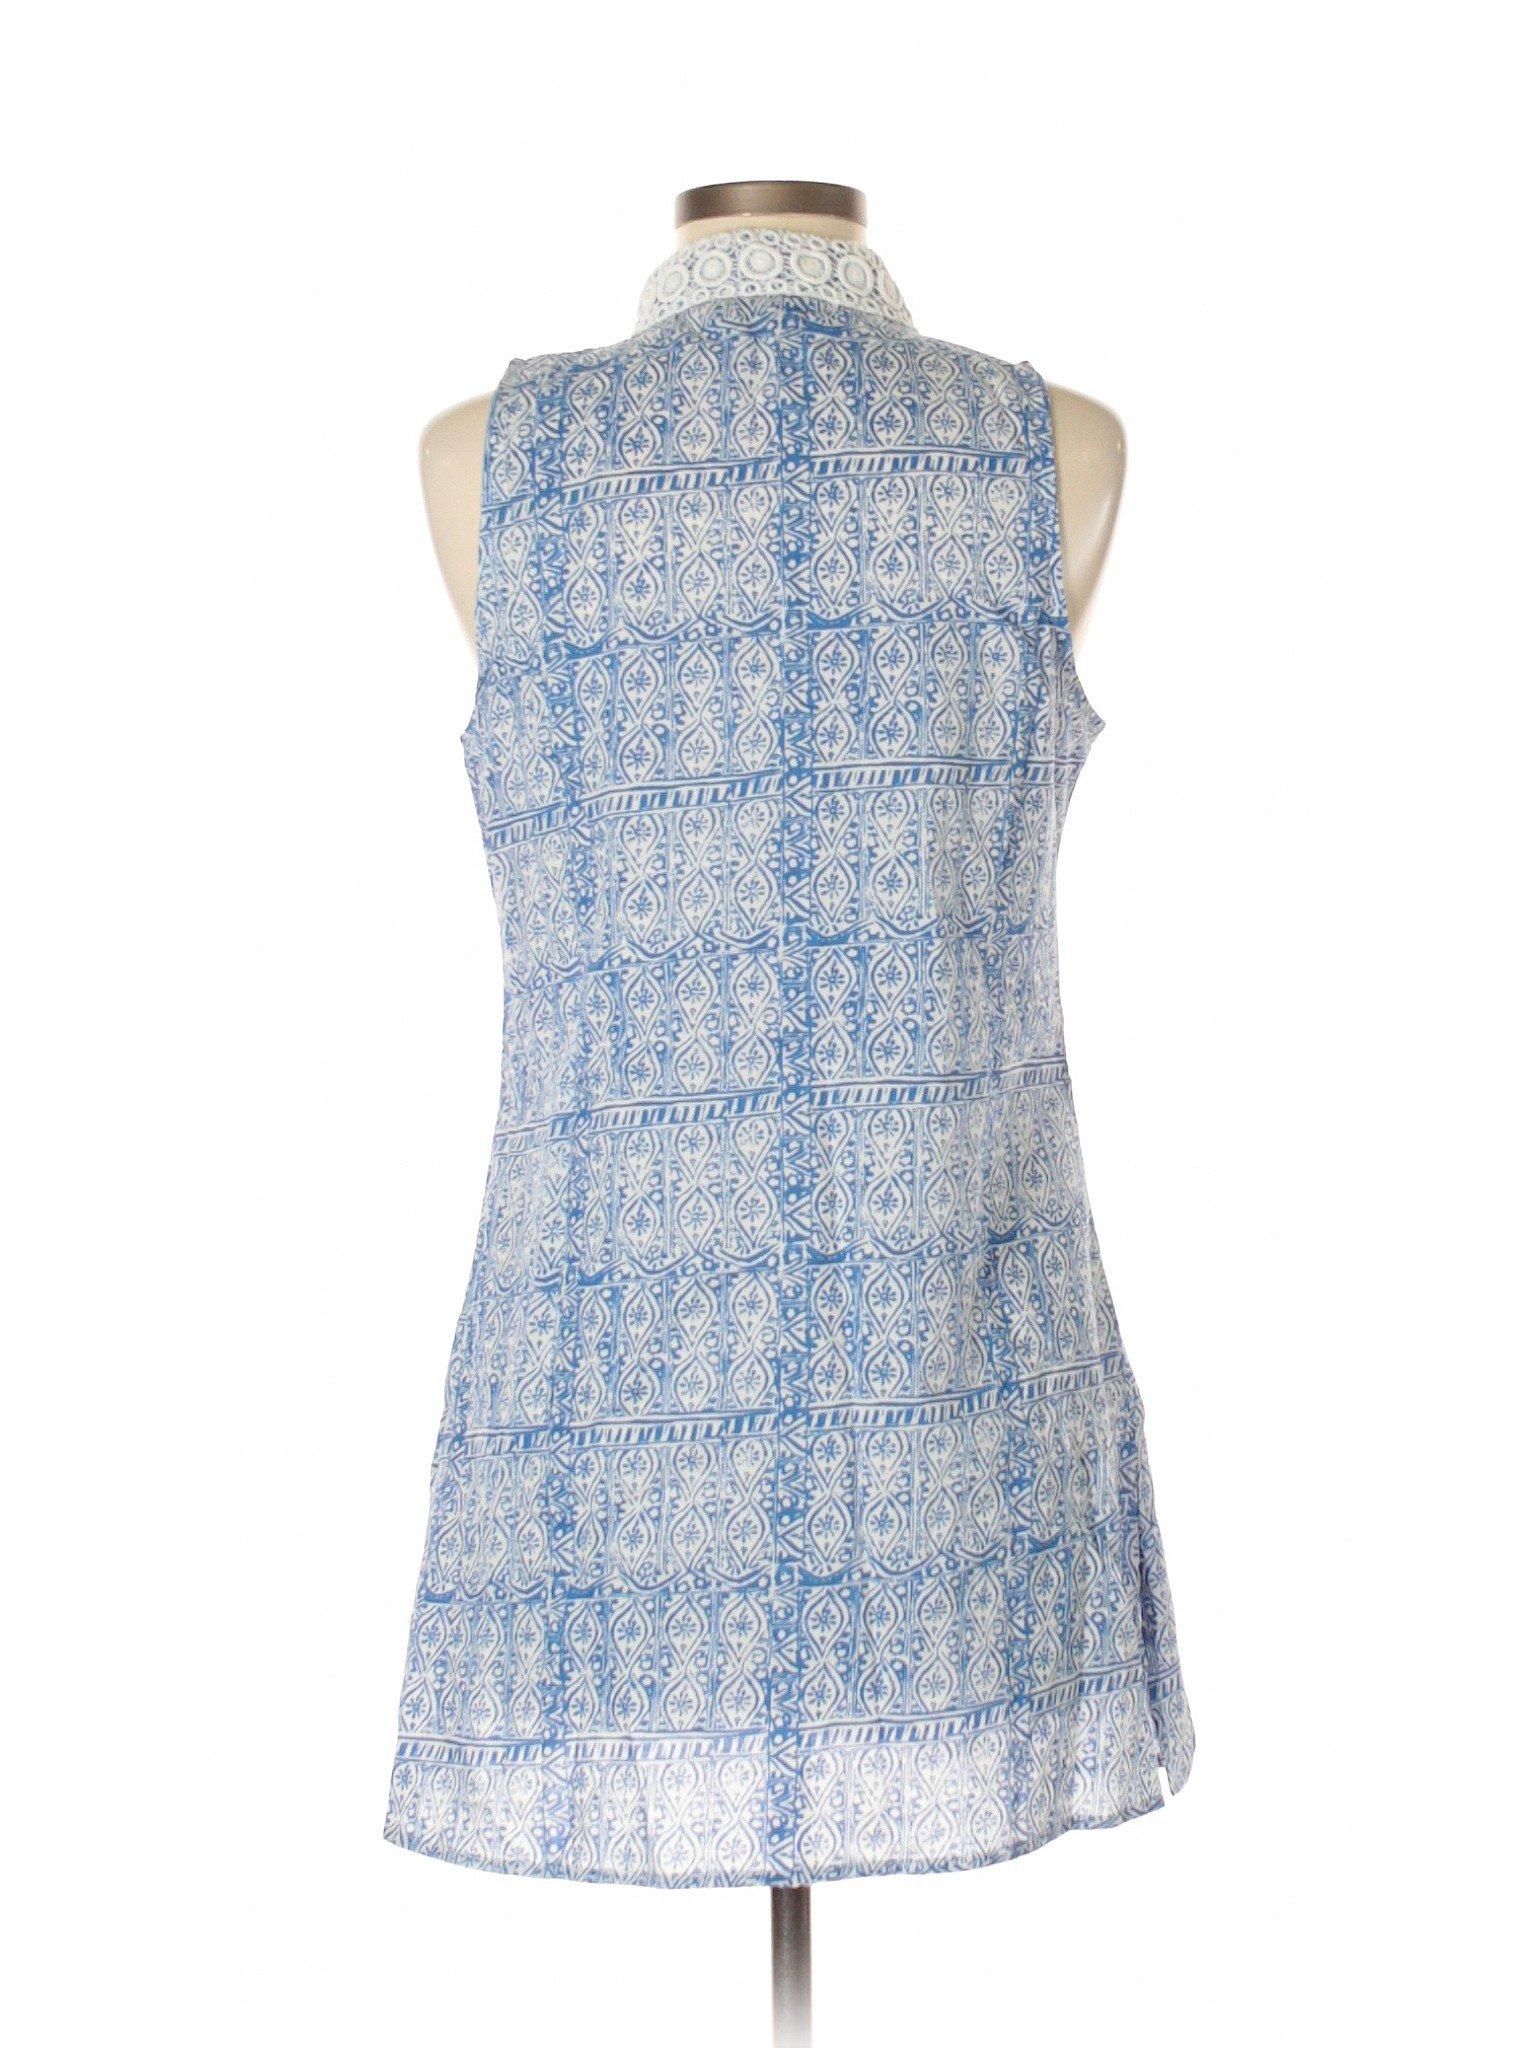 Flower Paper Dress Casual winter Boutique Rock gt4FwqEPxP